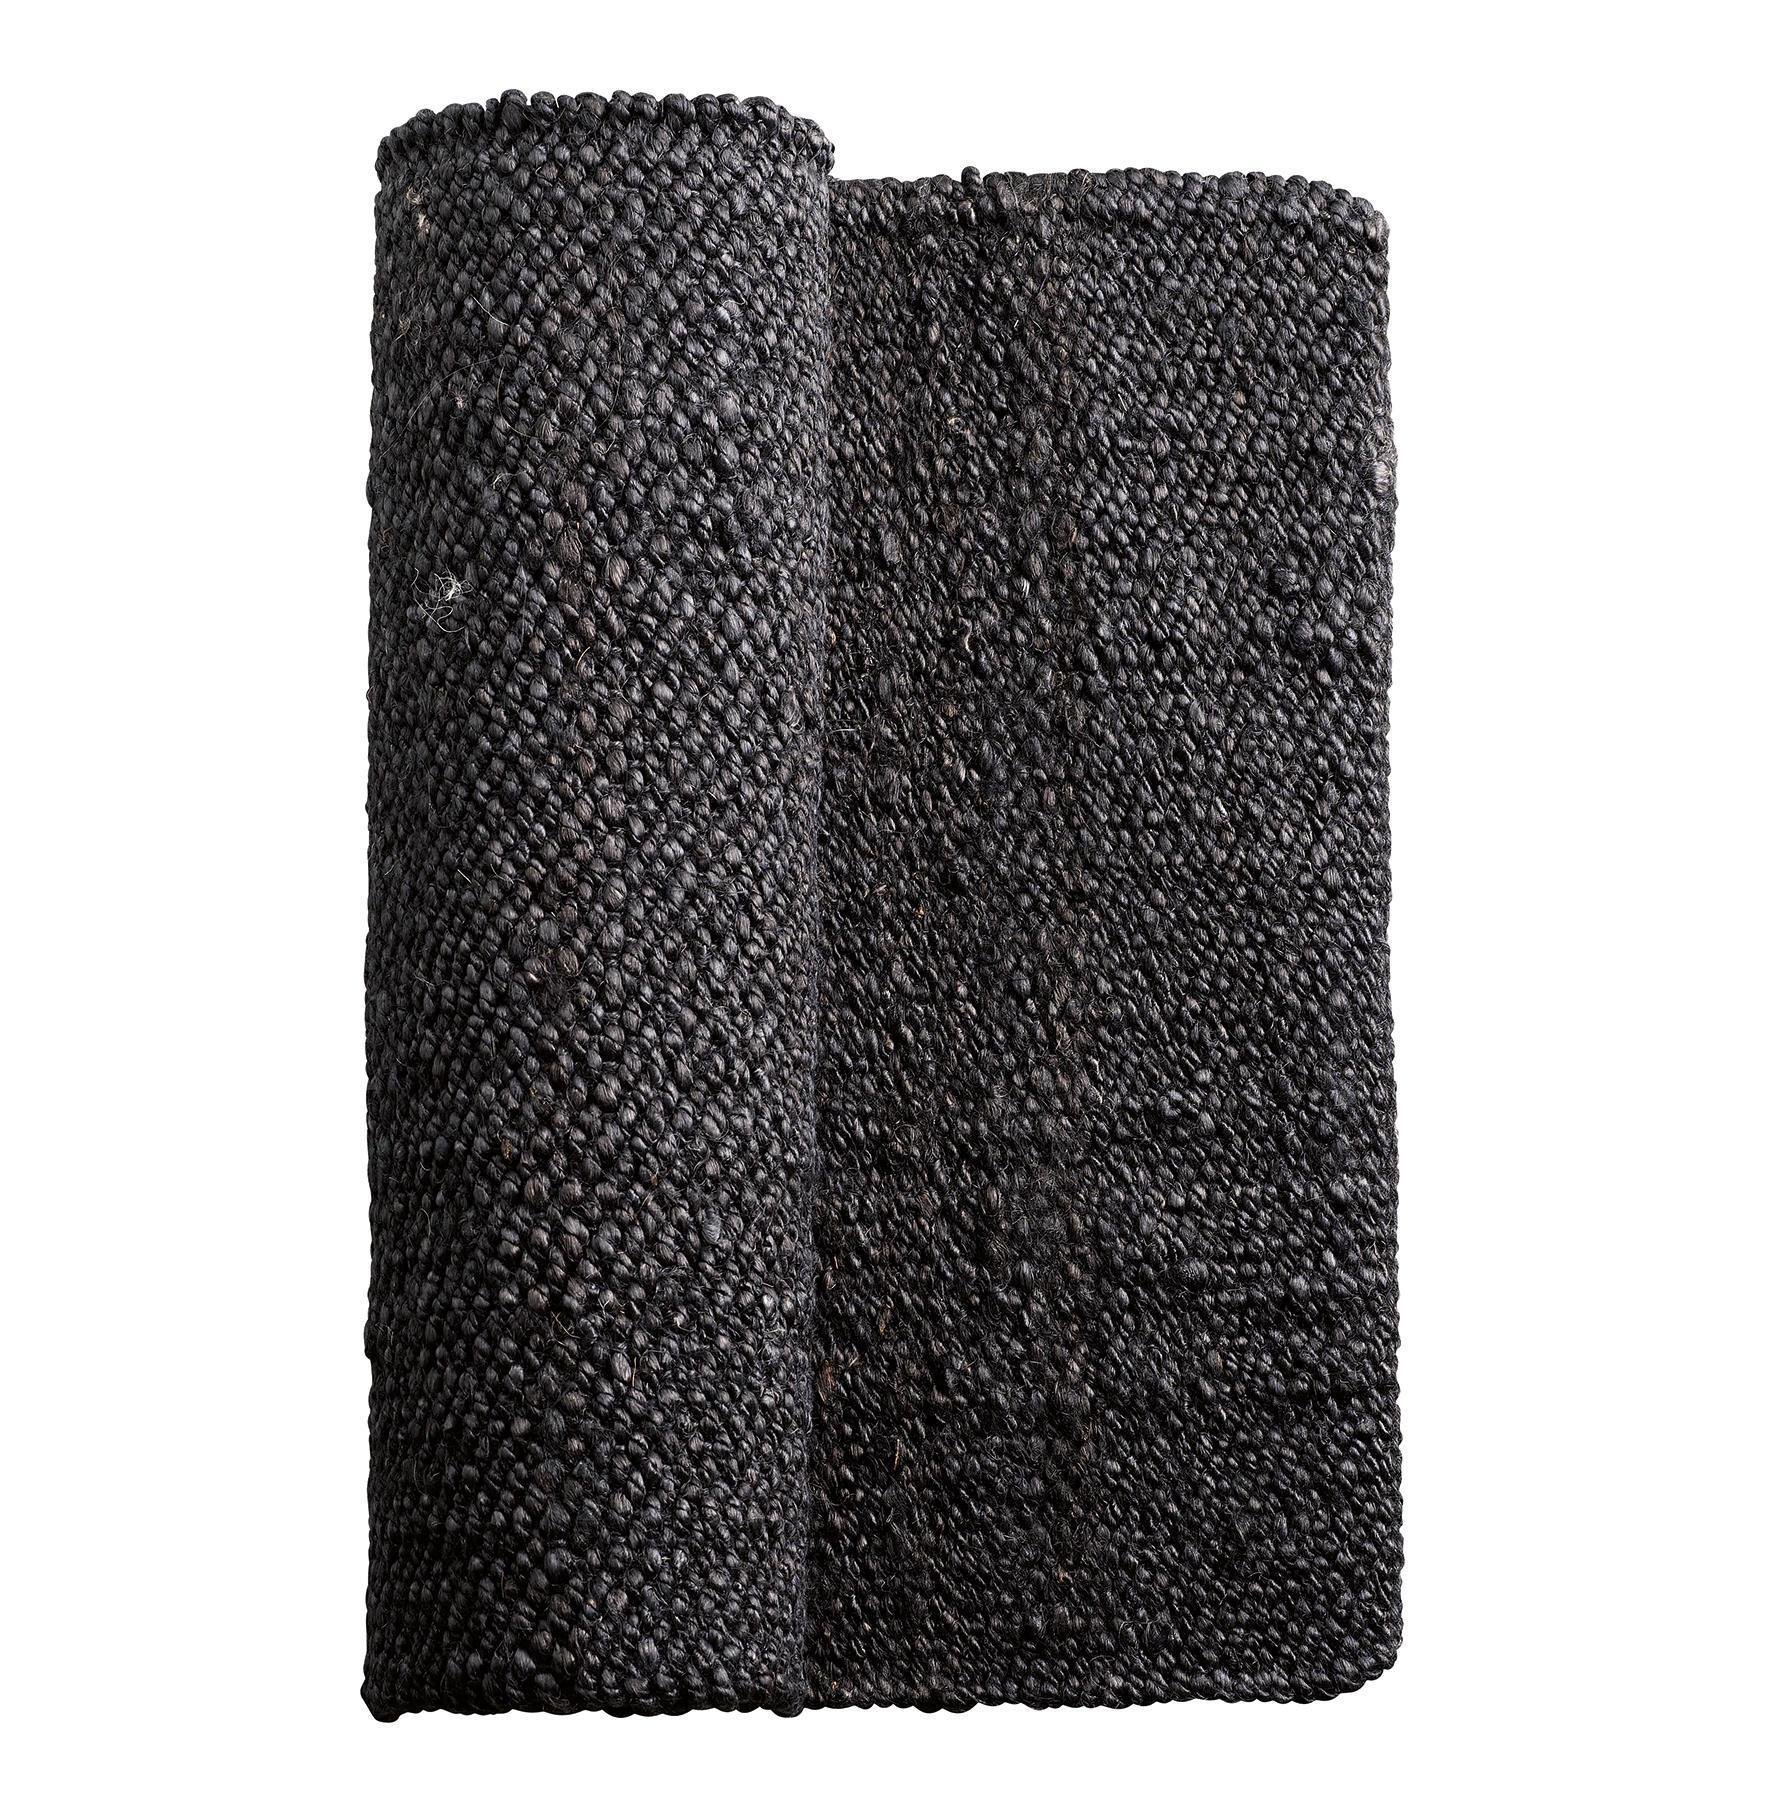 tineKhome Jutový koberec Soil 80x250 cm, černá barva, textil Černá